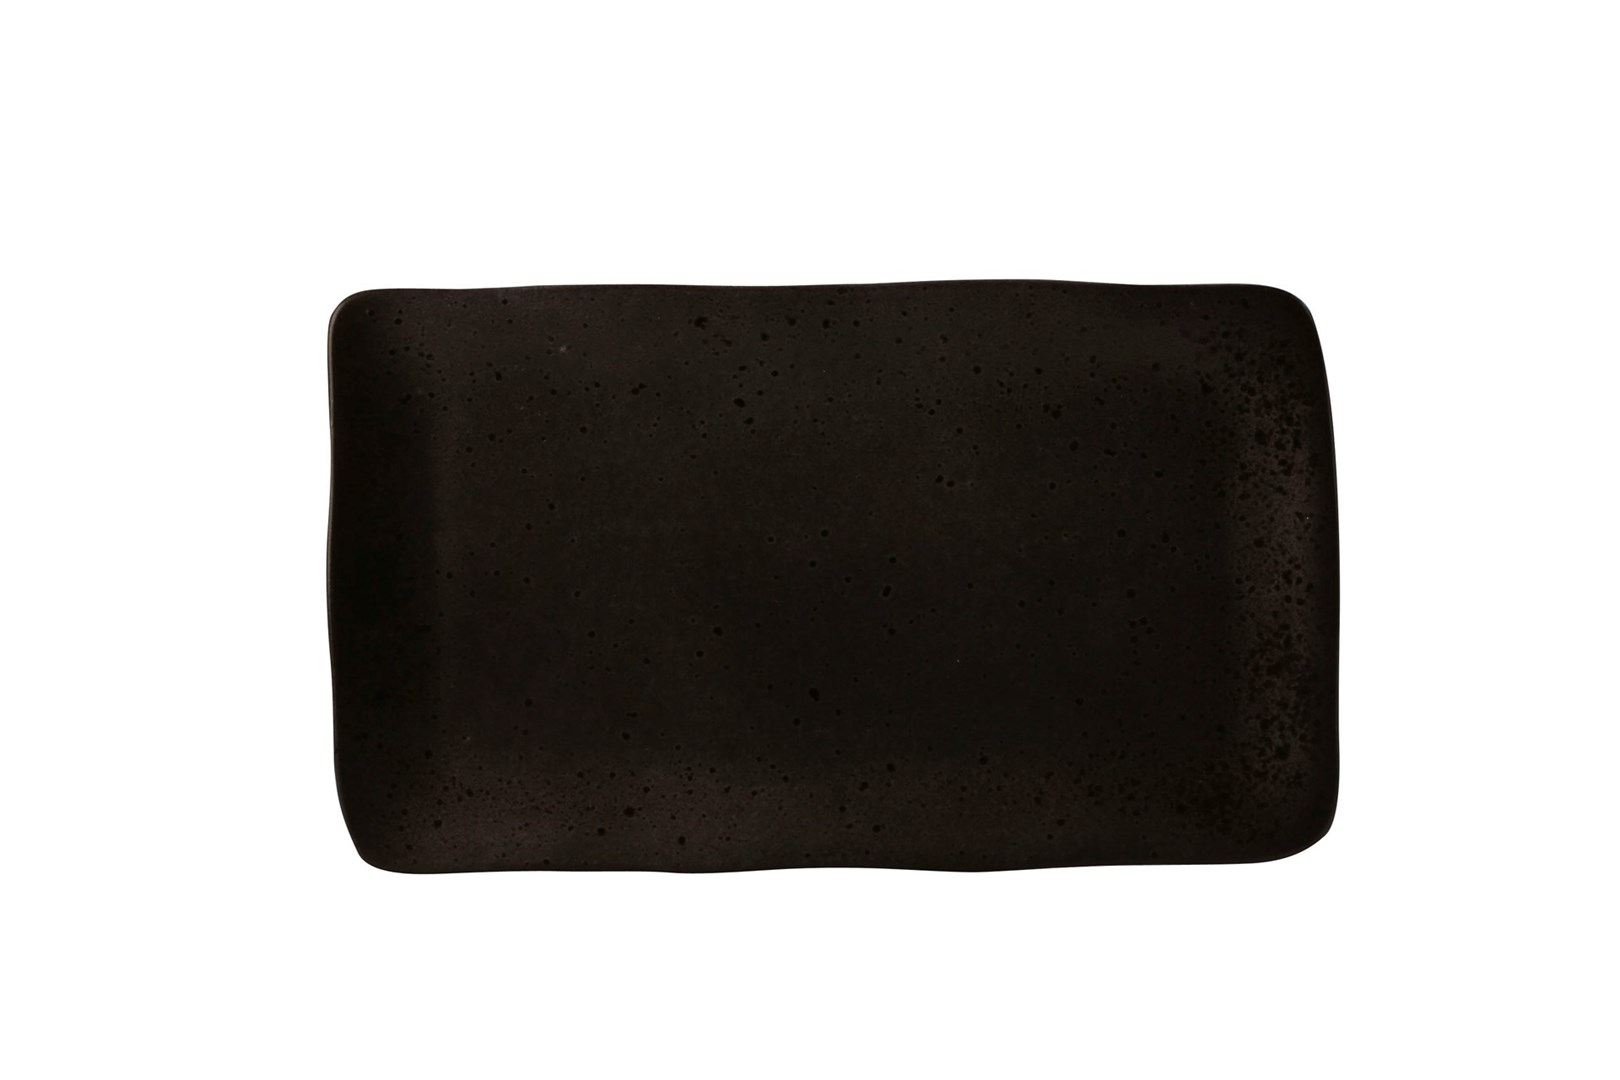 Productafbeelding Rustico Irone stone rechthoekig bord 35 x 21 cm